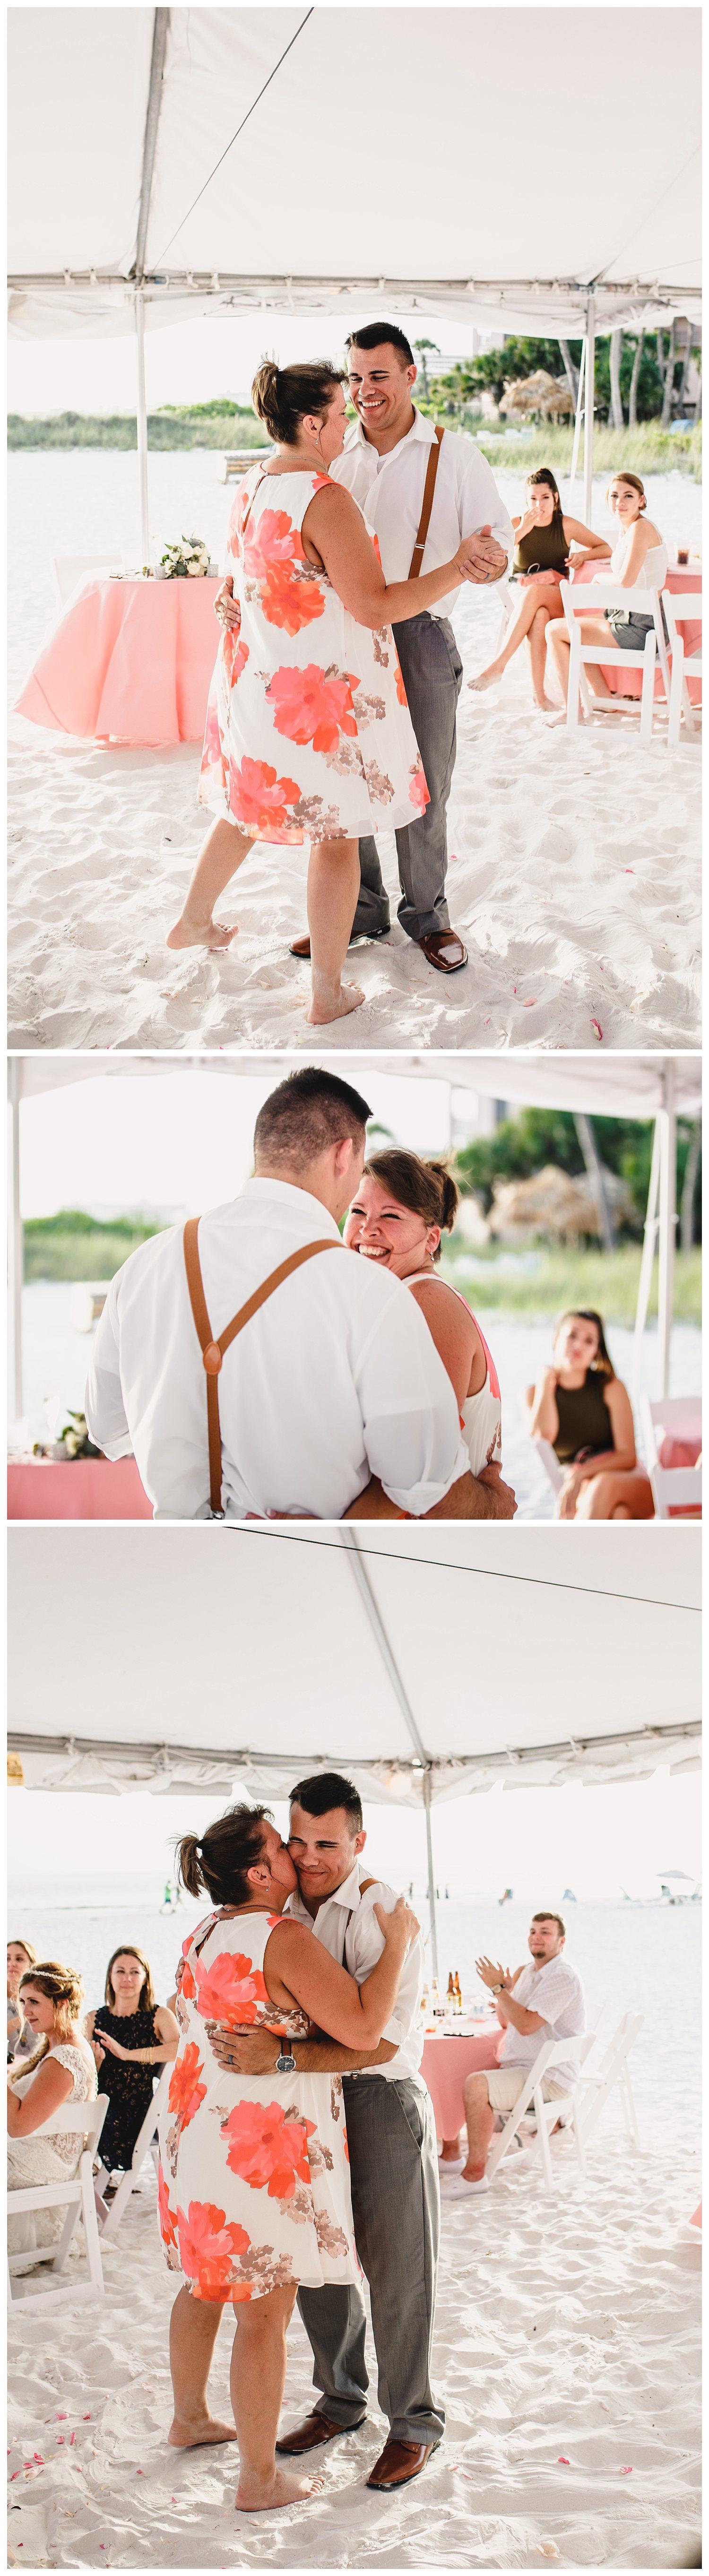 Kelsey_Diane_Photography_Destination_Wedding_Sarasota_Florida_Beach_Wedding_Alex_Austin_0670.jpg